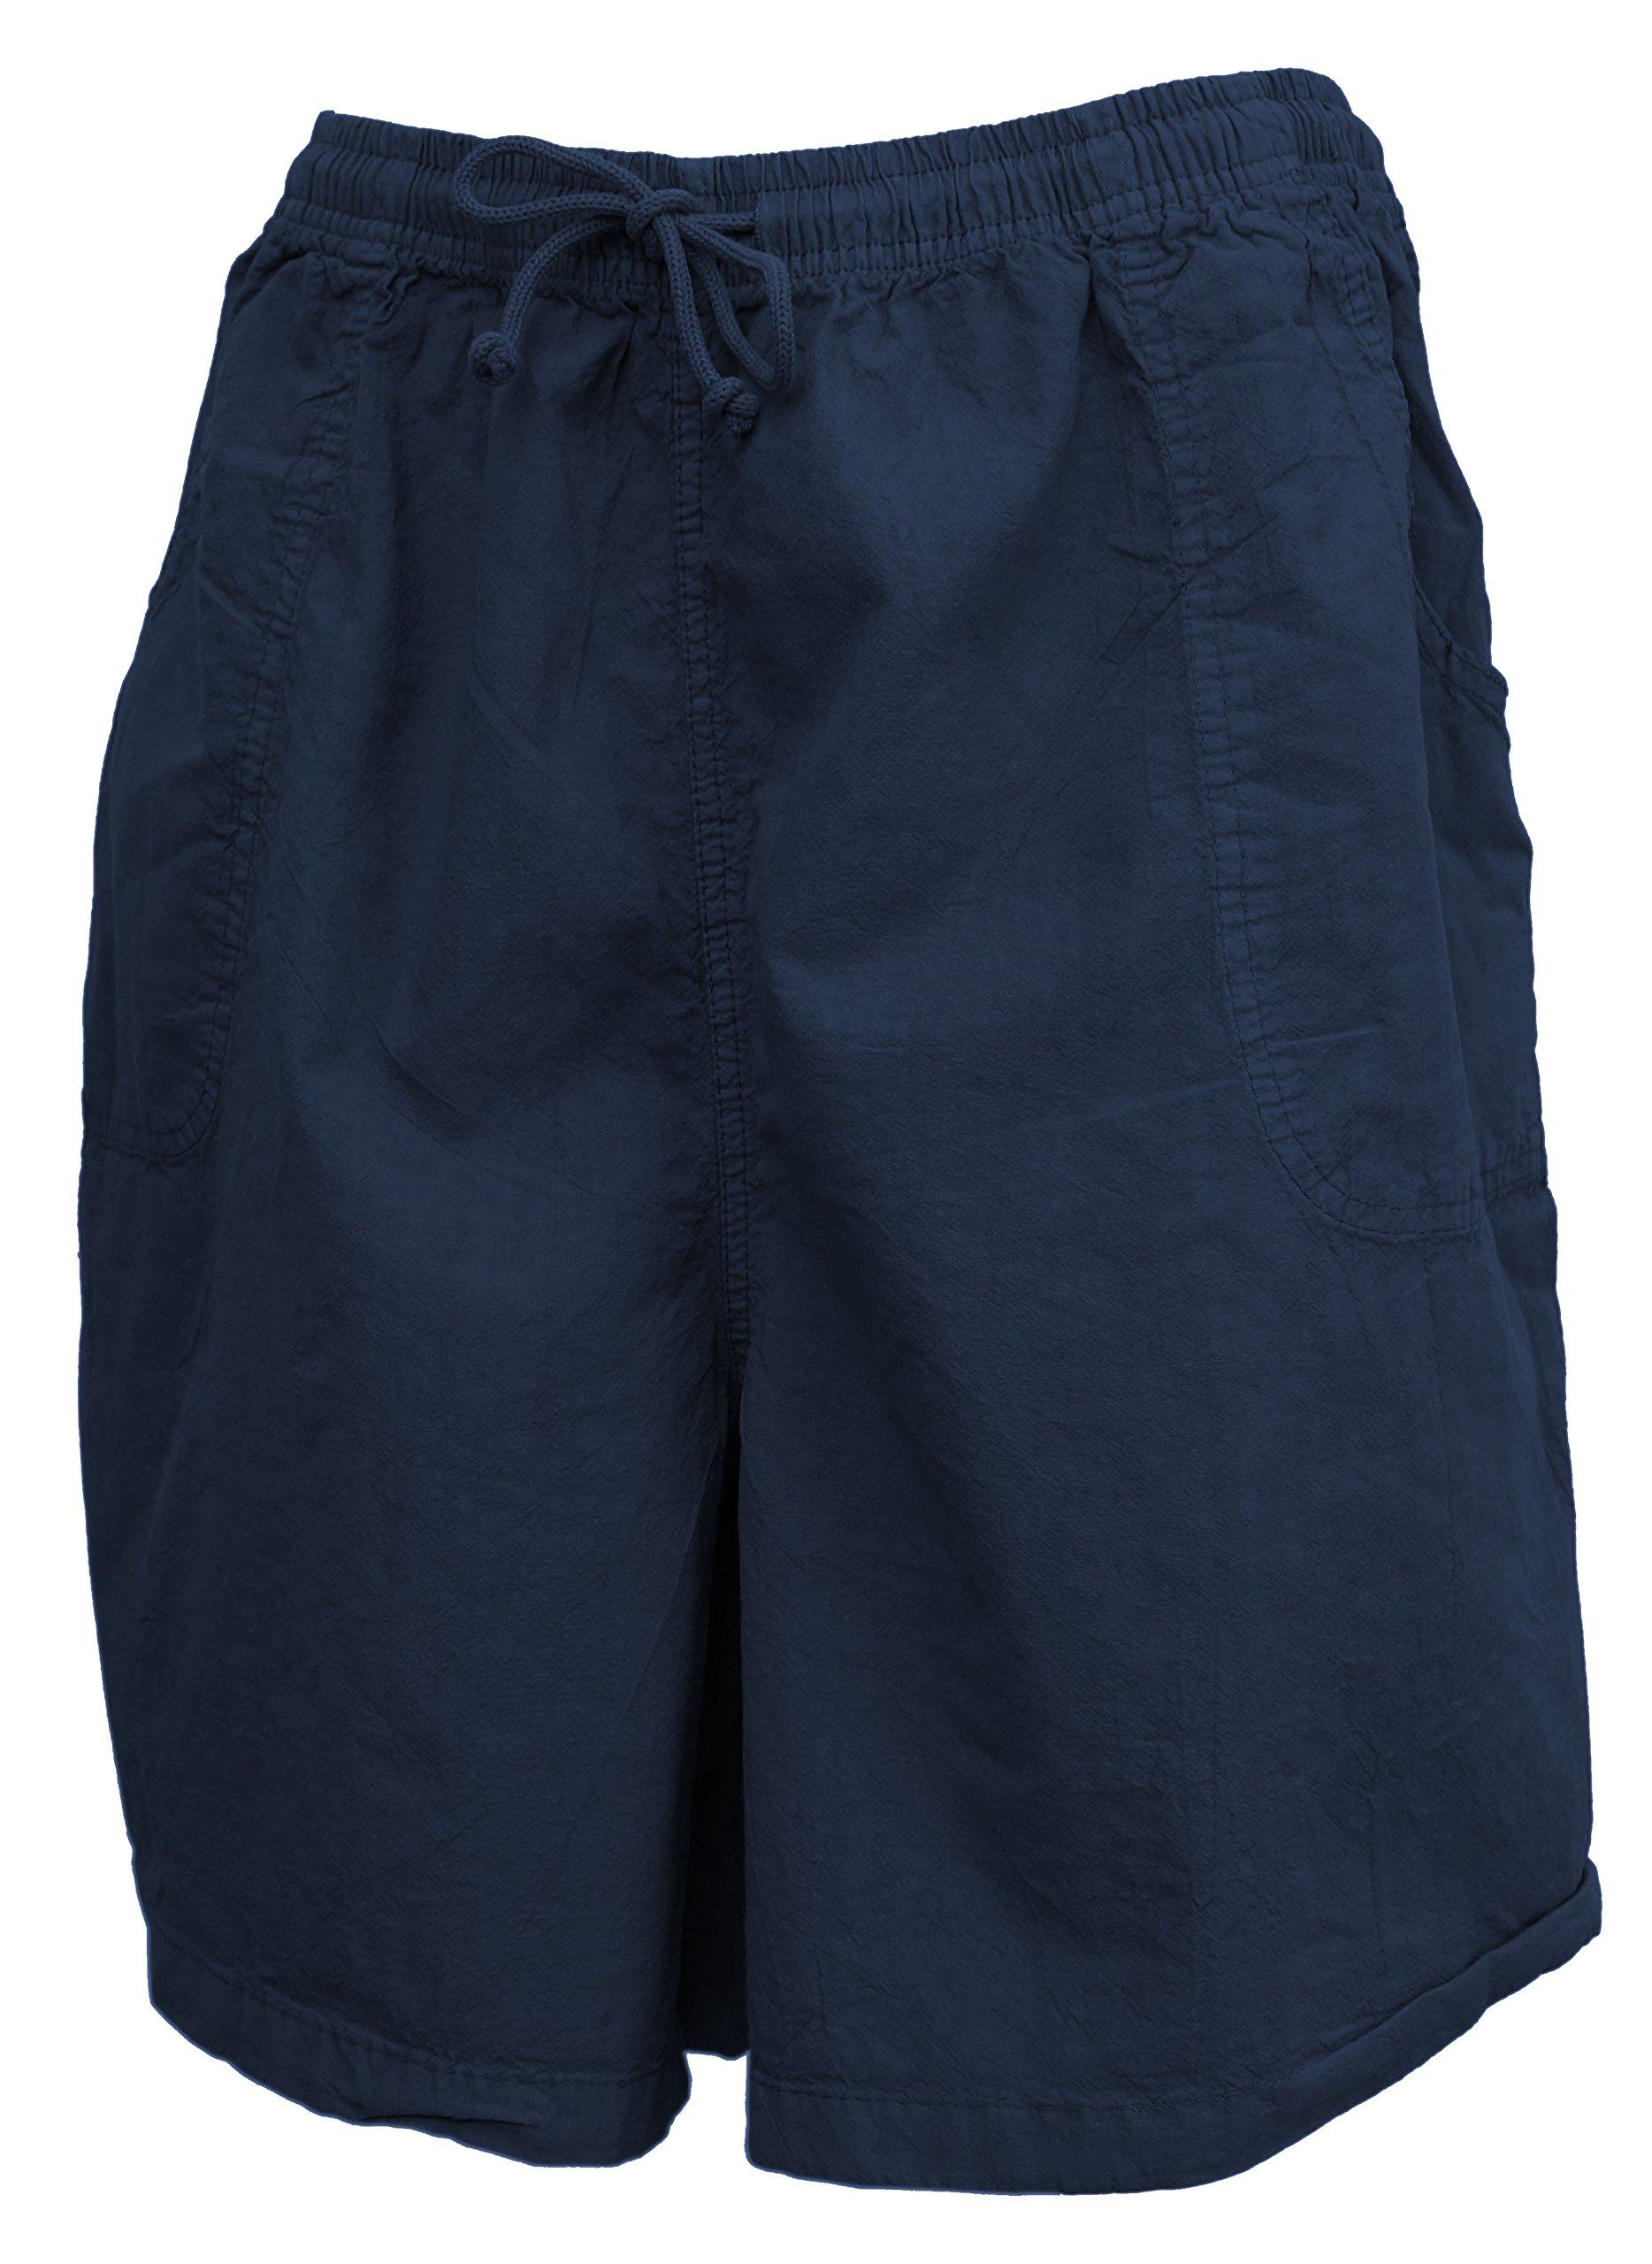 Salem Straits Women's Plus Size 100% Cotton Sheeting Cargo Shorts (Navy Blue, 1X) by Salem Straits